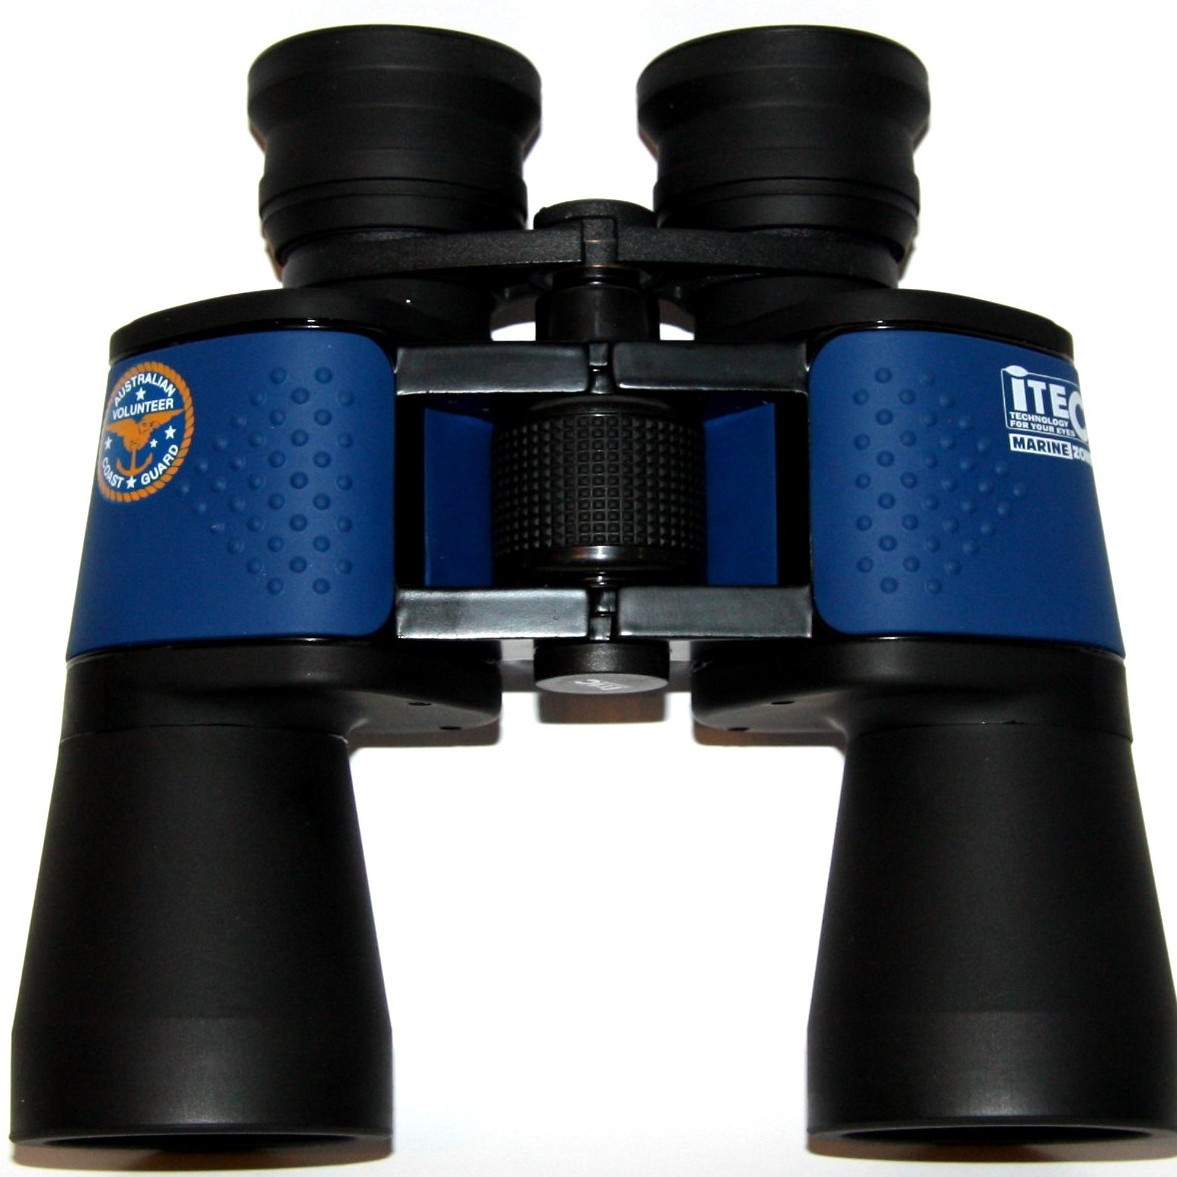 Binocular 7x50 Centre Focus Itec Aust Coast Guard Marine ...